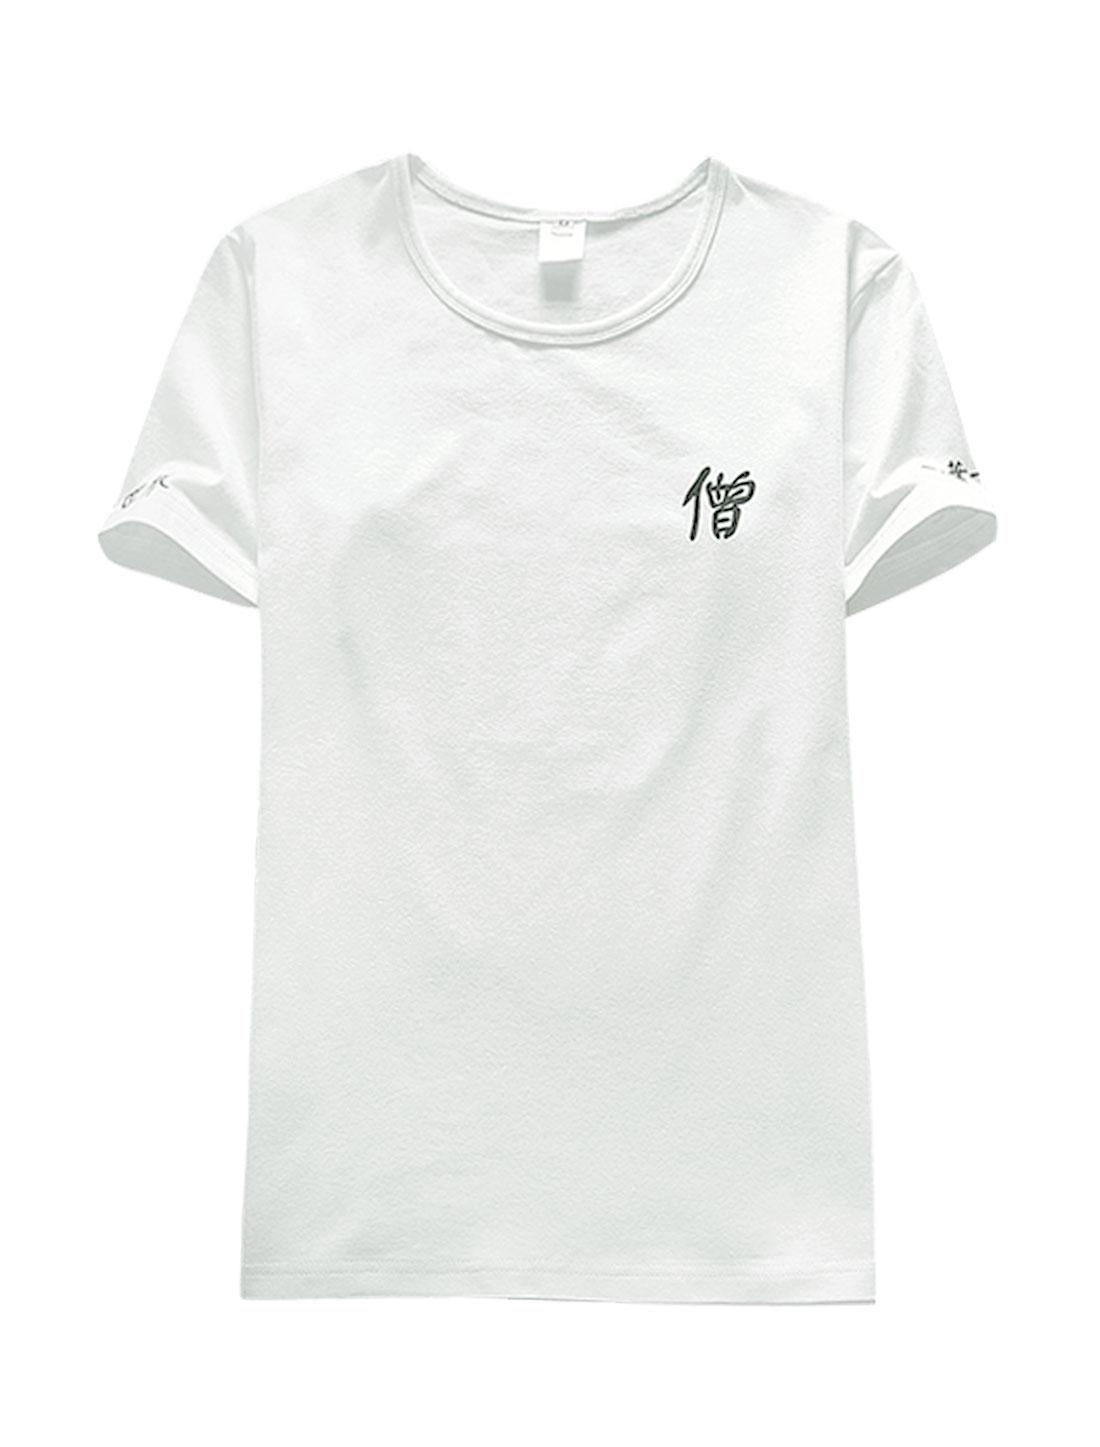 Men Chinese Prints Short Sleeves Slim Fit Tee Shirt White M